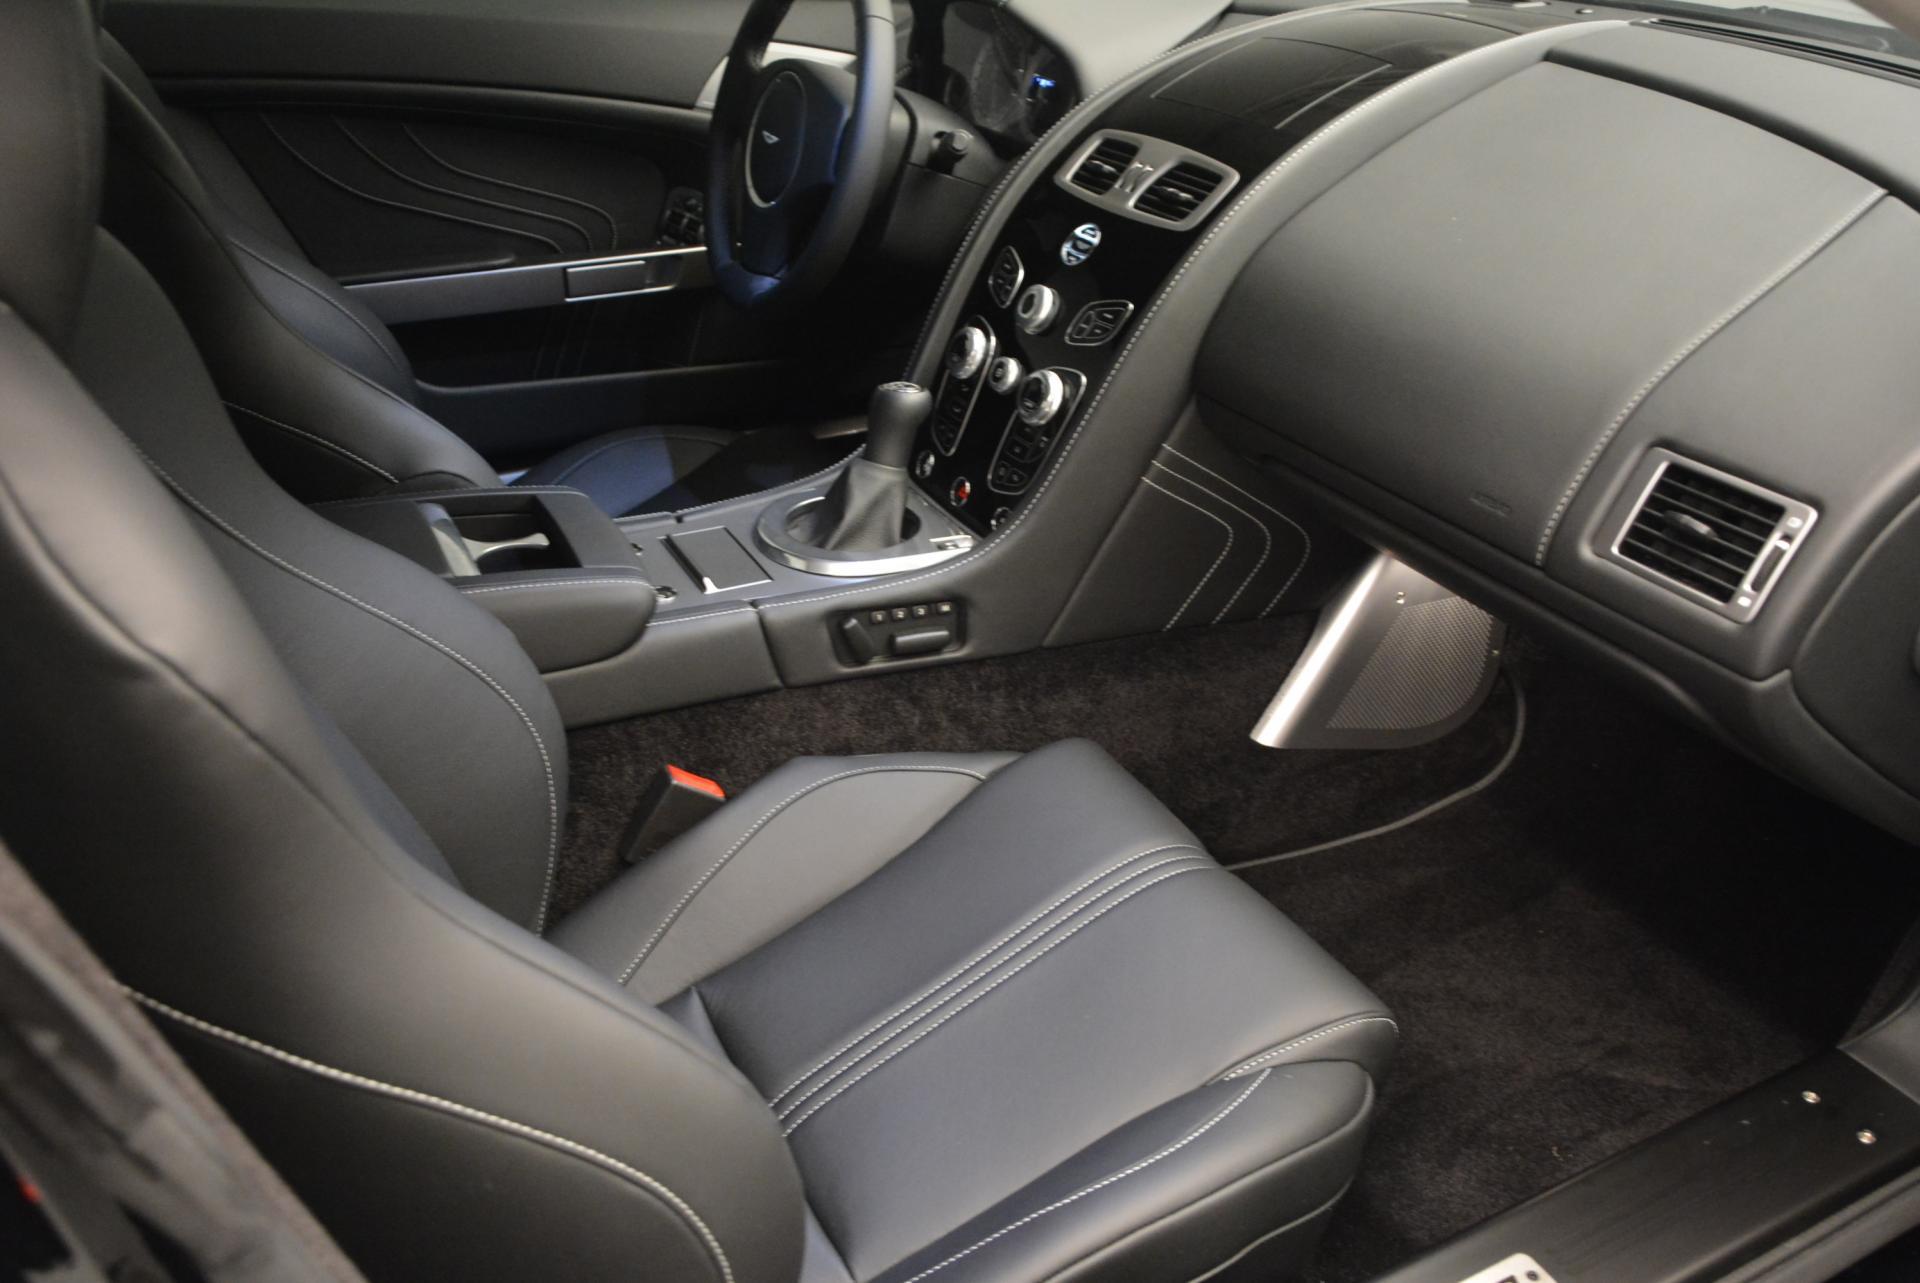 New 2016 Aston Martin V8 Vantage GTS S